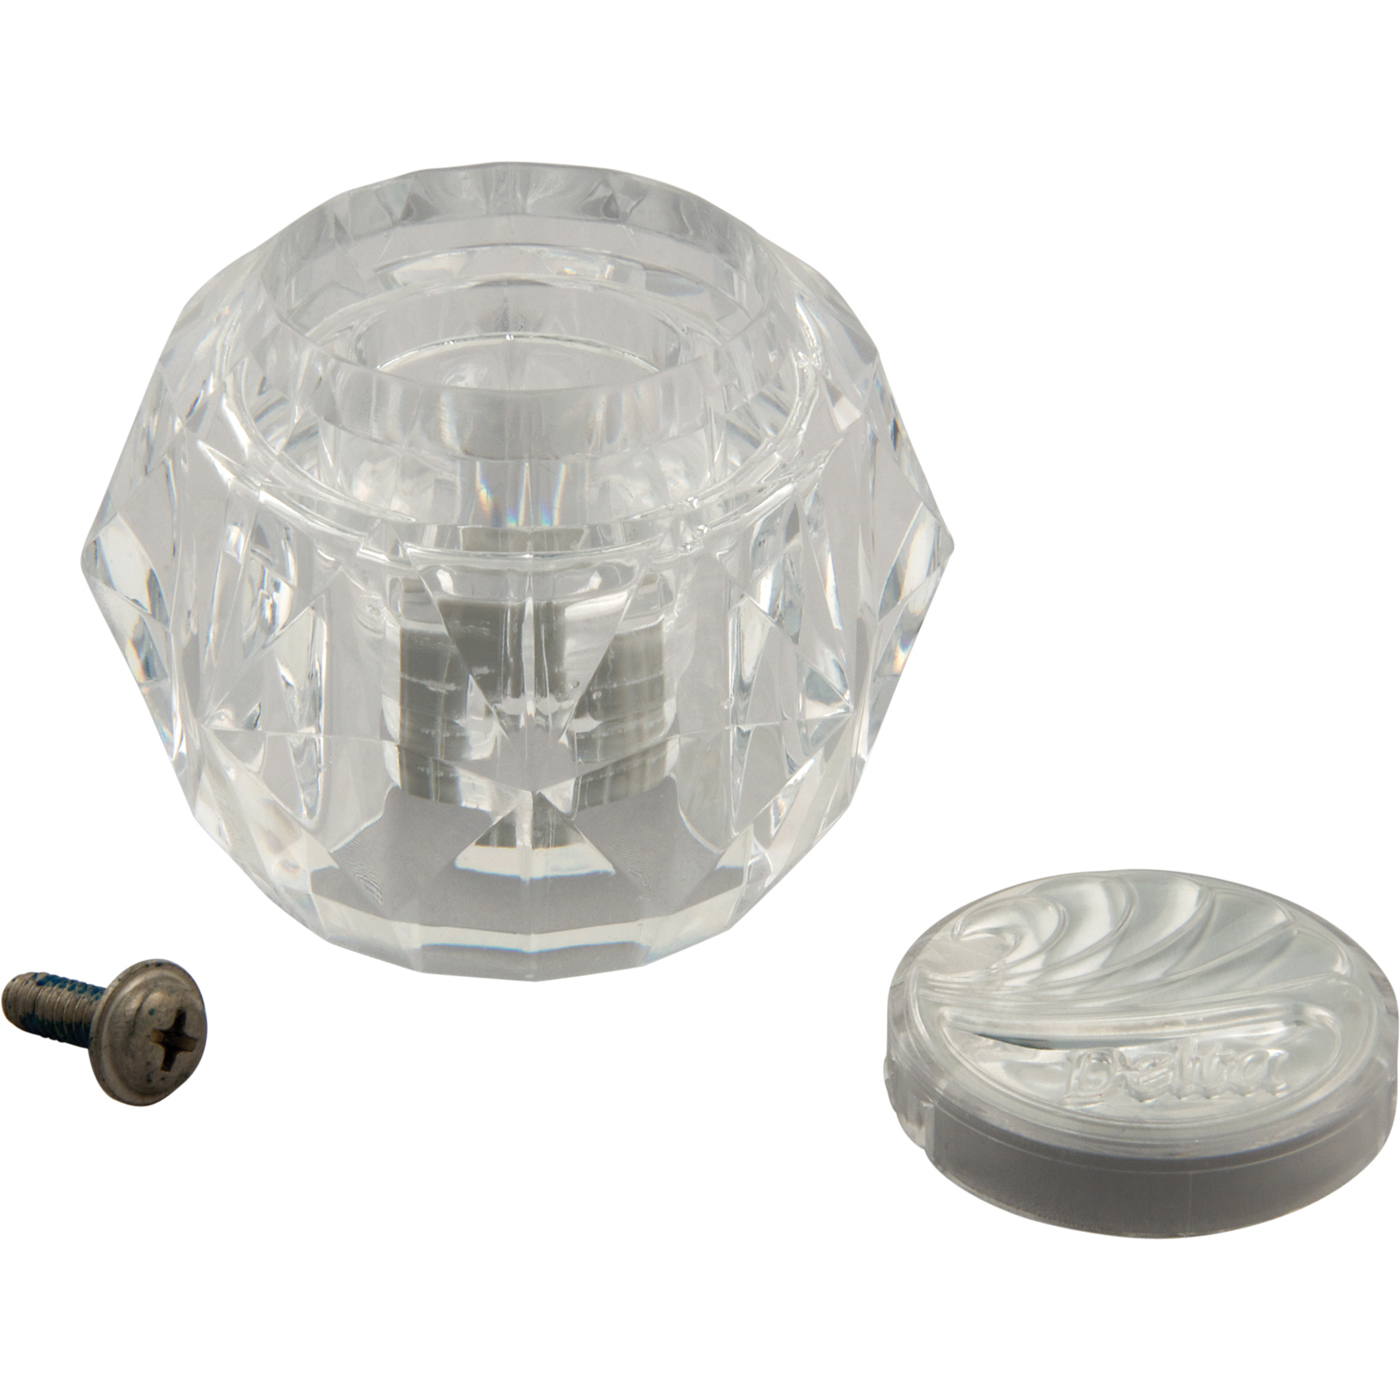 Delta 174 Acrylic Handle For Single Lever Lavatory Faucet